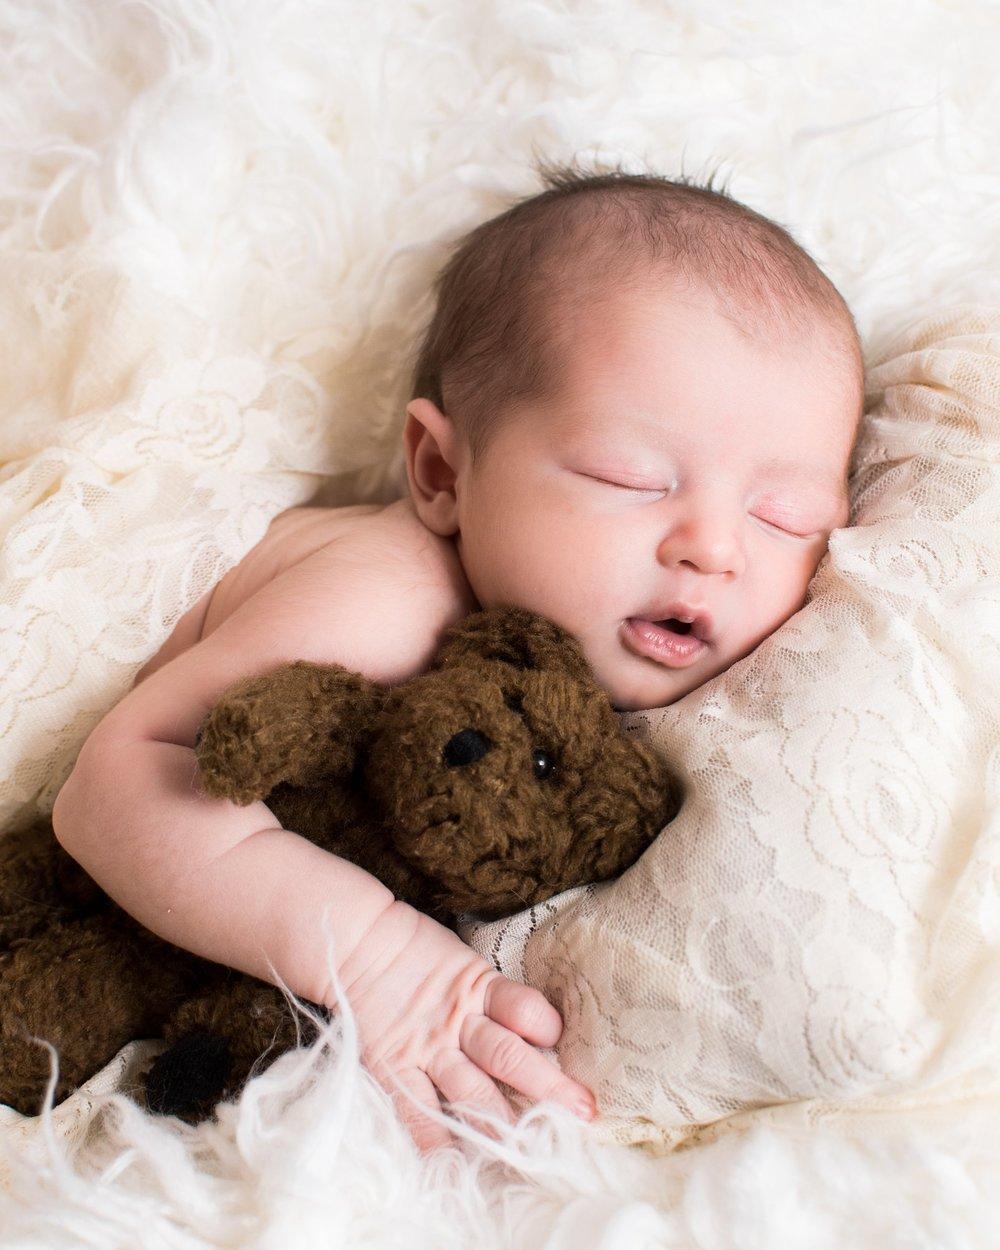 Kyla Jo Photography // Muncie, Indiana // Newborn Photos // Newborn Session // Muncie indiana newborn session // Newborn photographer muncie indiana // indiana newborn photographer // Teddy Bear in Newborn Photos